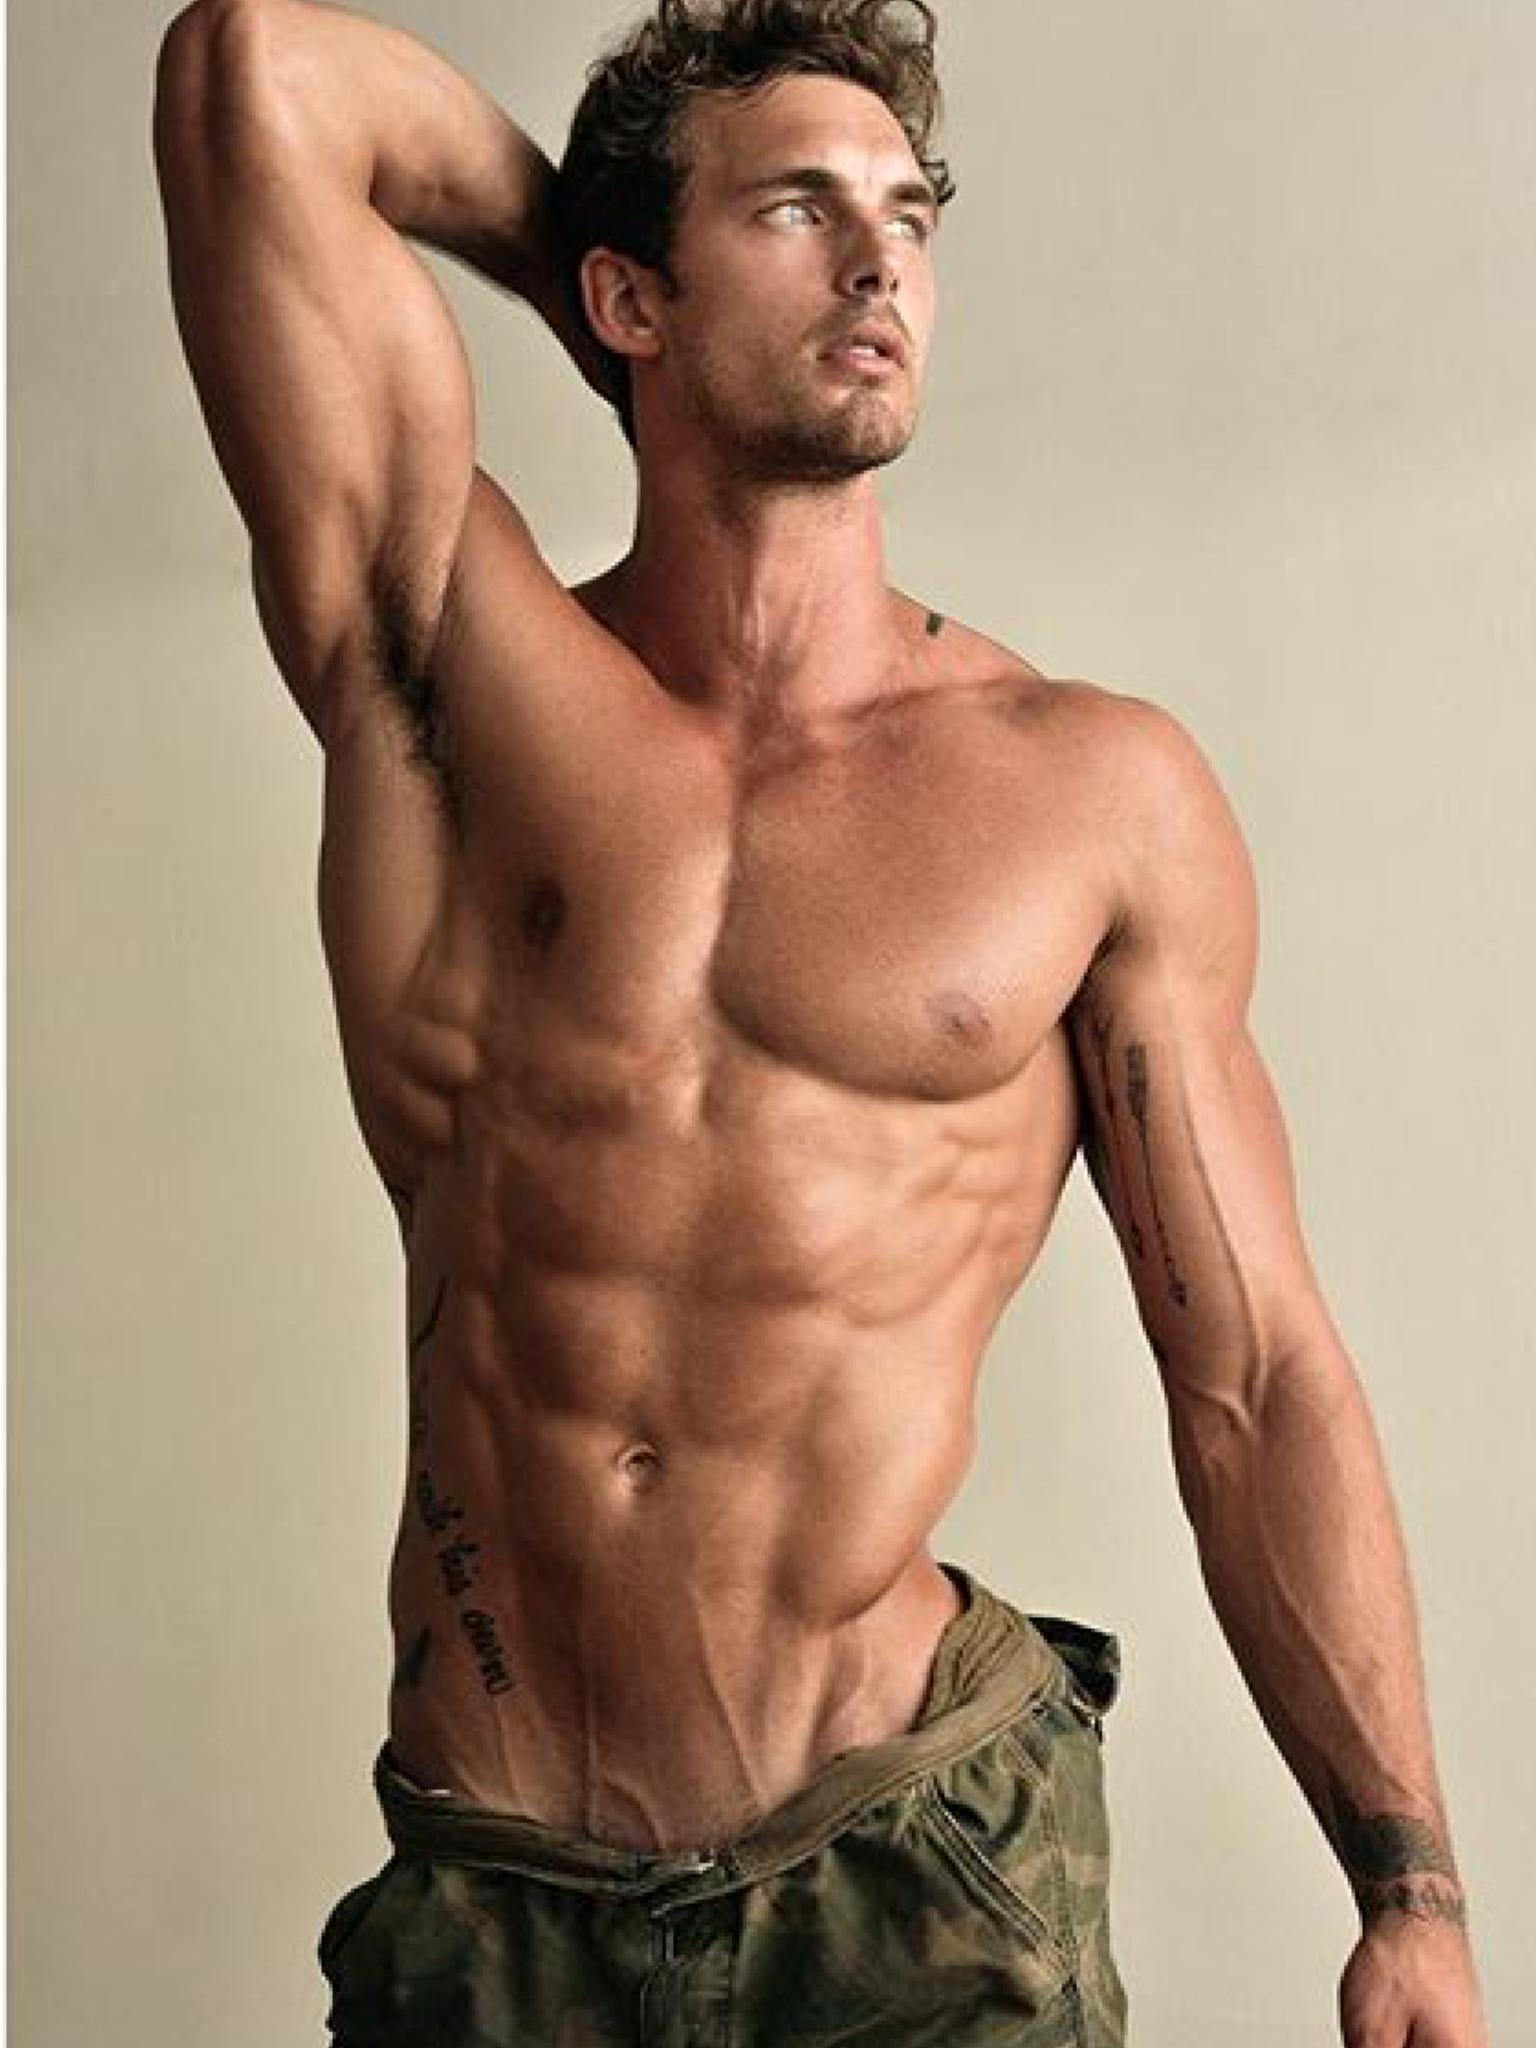 Hot Gay Asian Men Nude Gif